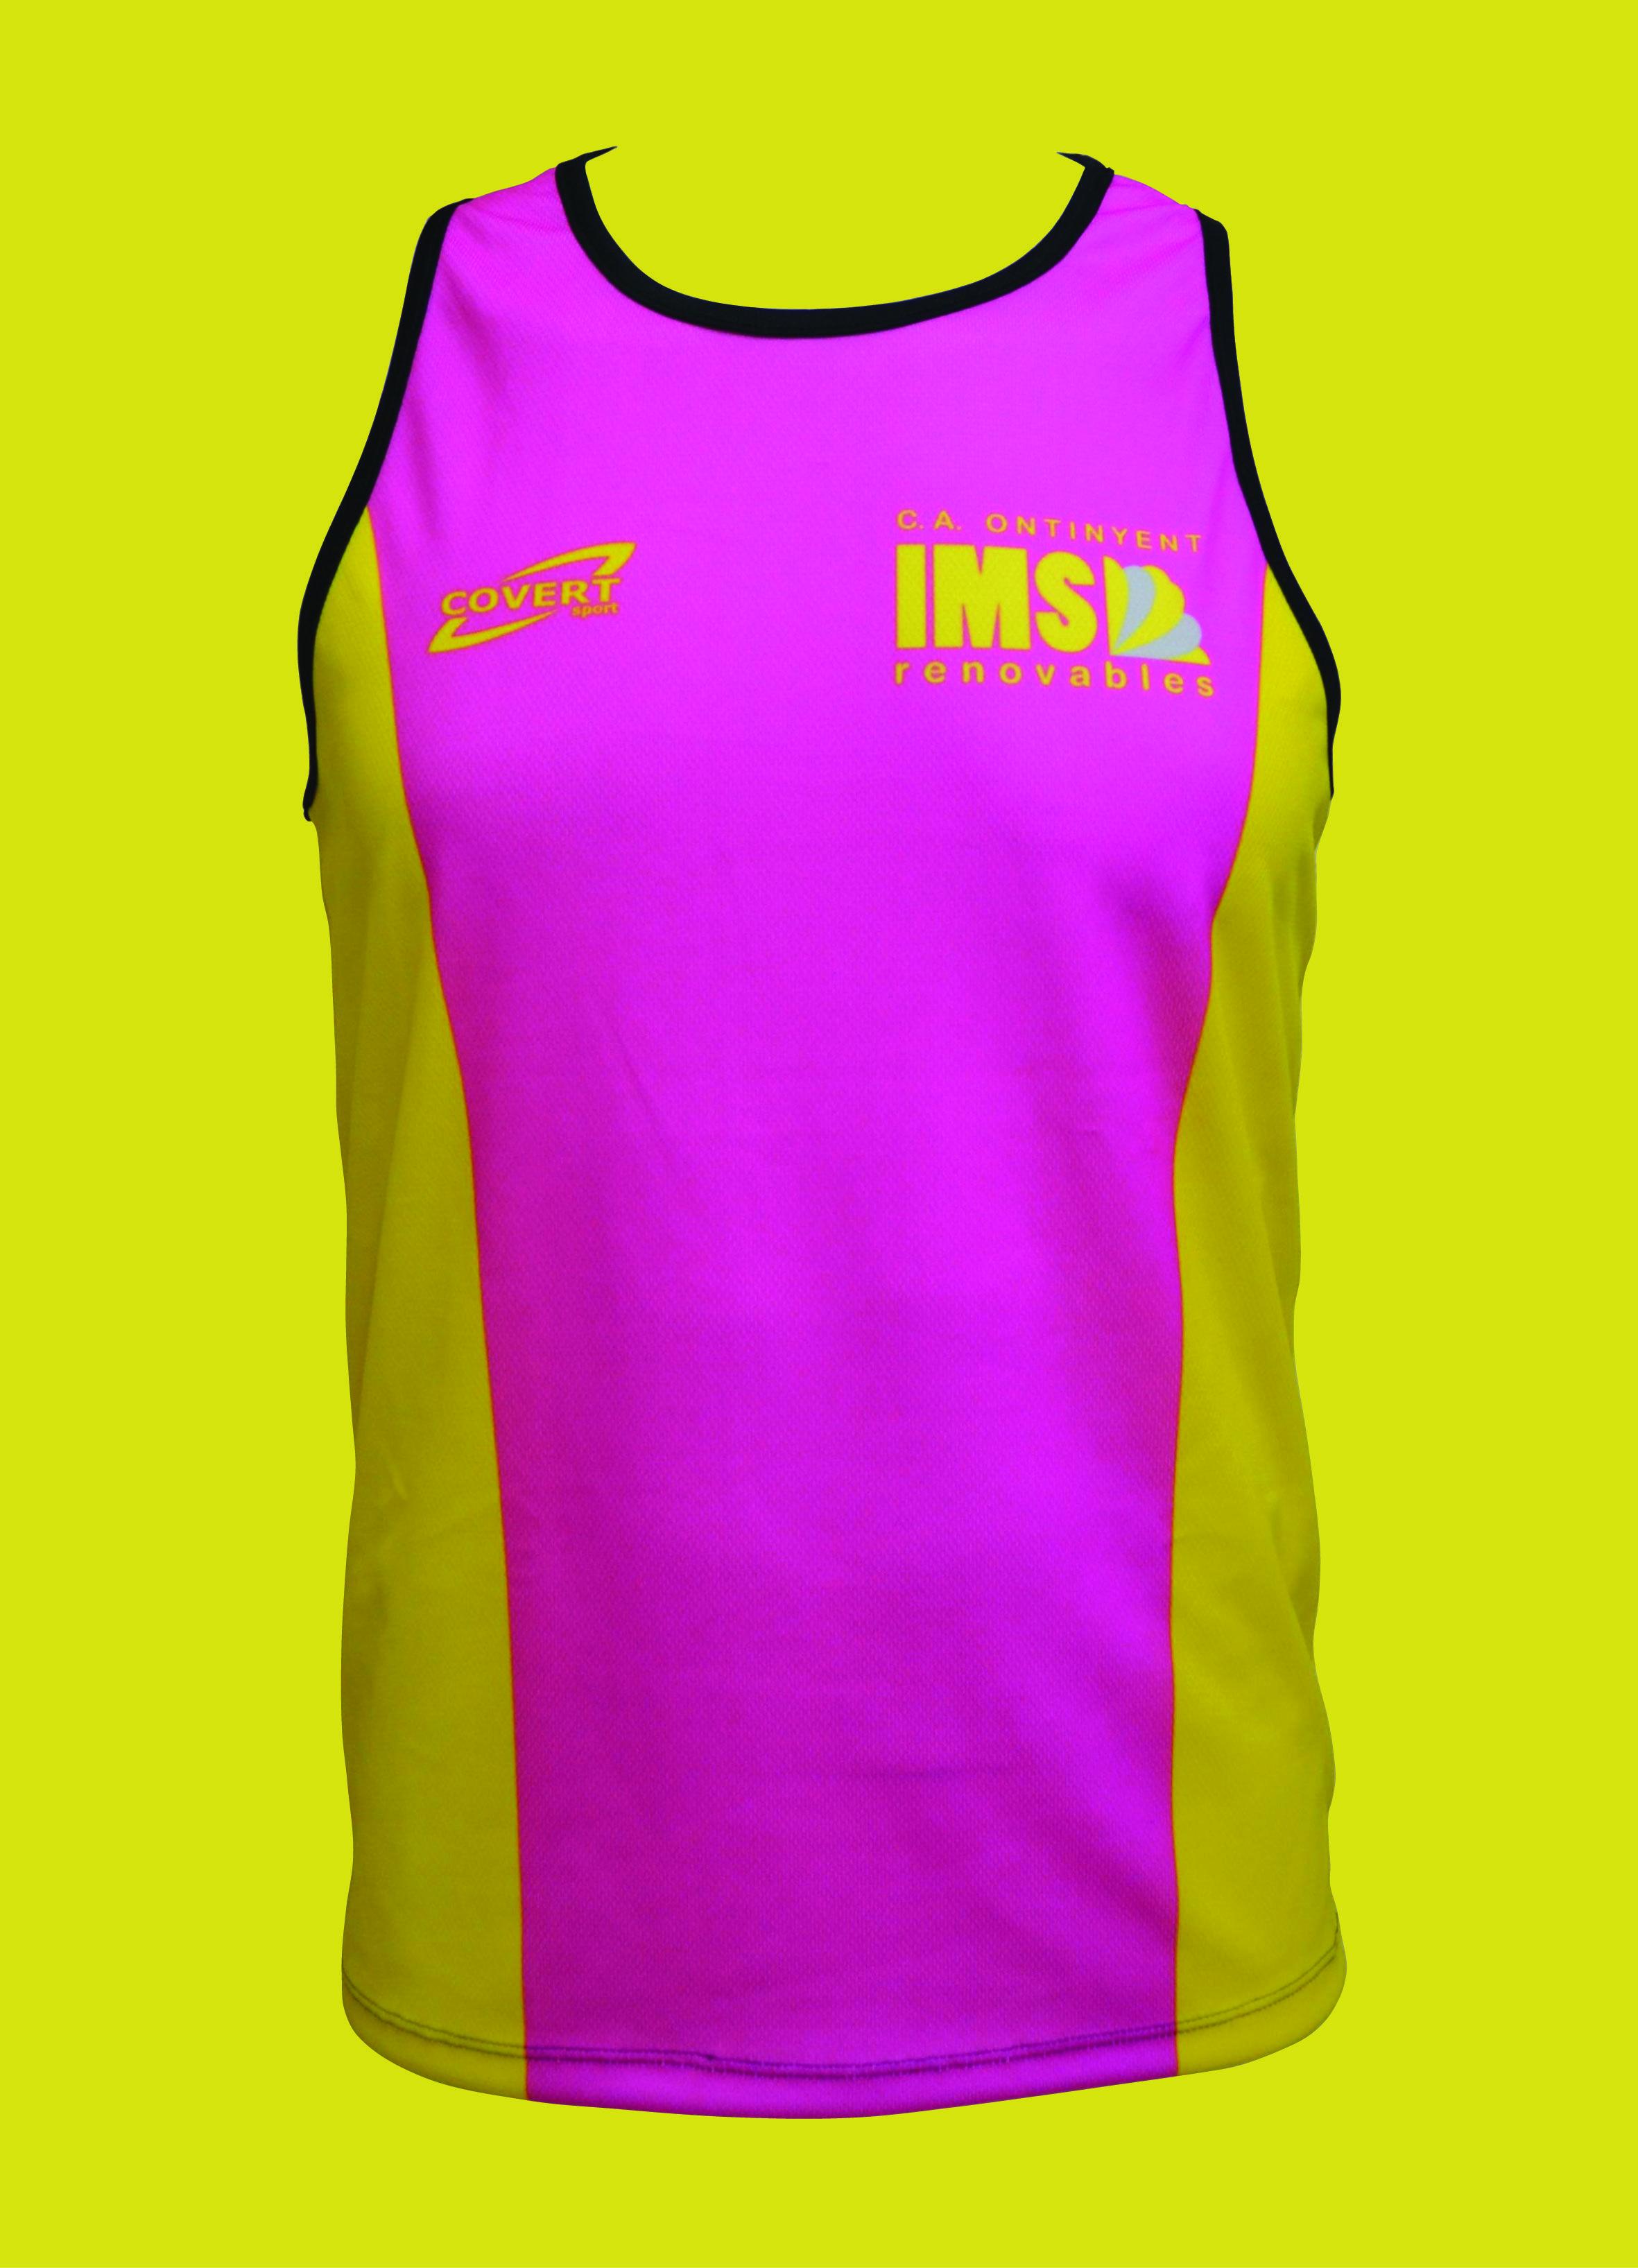 Covert Sport - Ropa Deportiva Personalizada - Camiseta Runner Tirantes Unisex